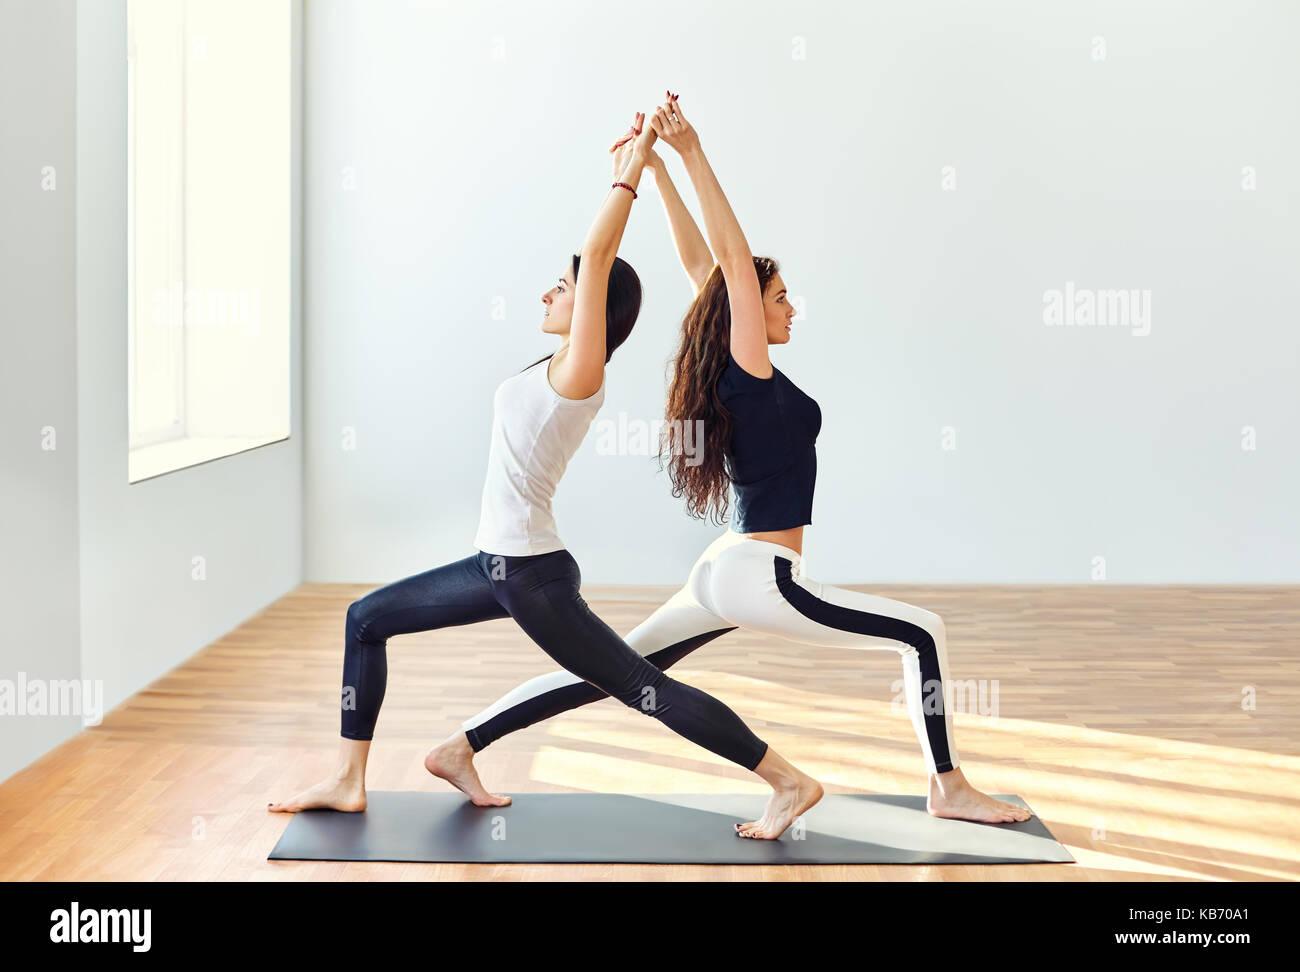 Two young women doing yoga asana warrior one pose. Virabhadrasana